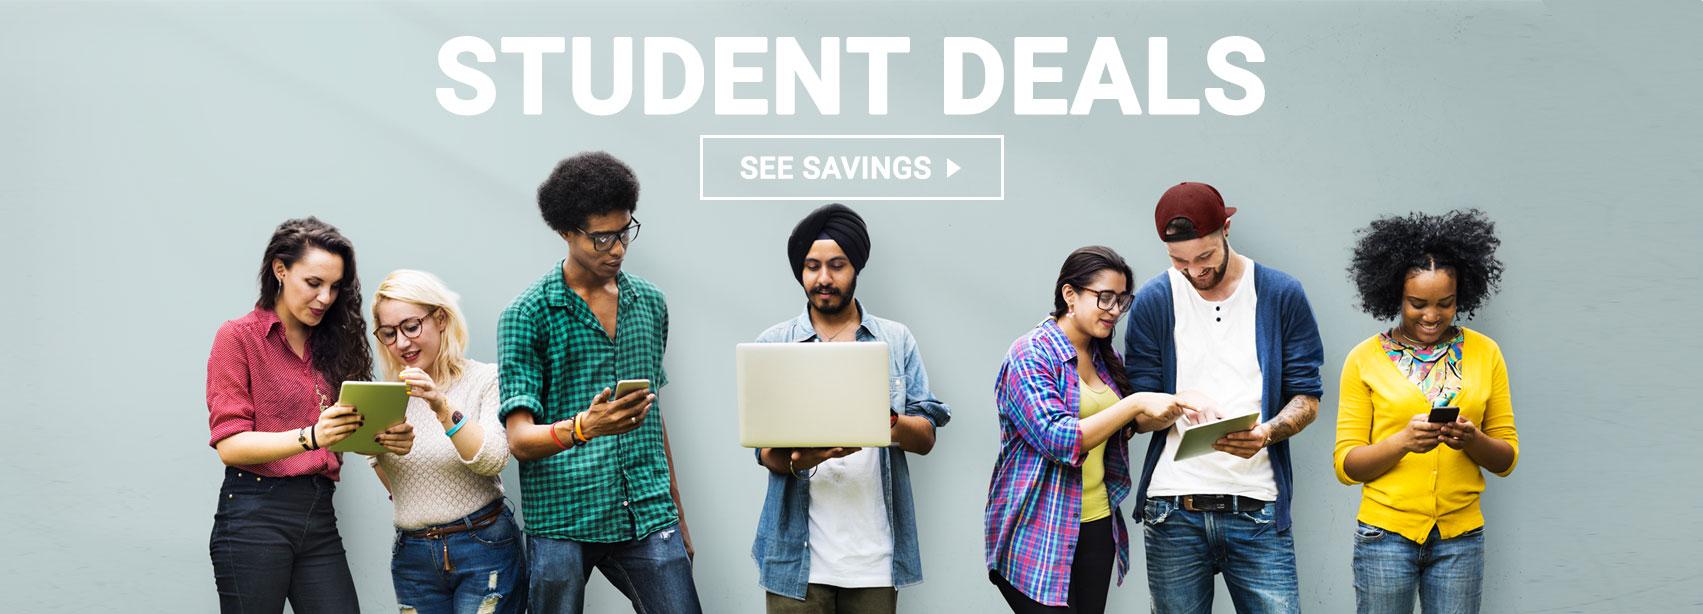 SaskTel Student Deals